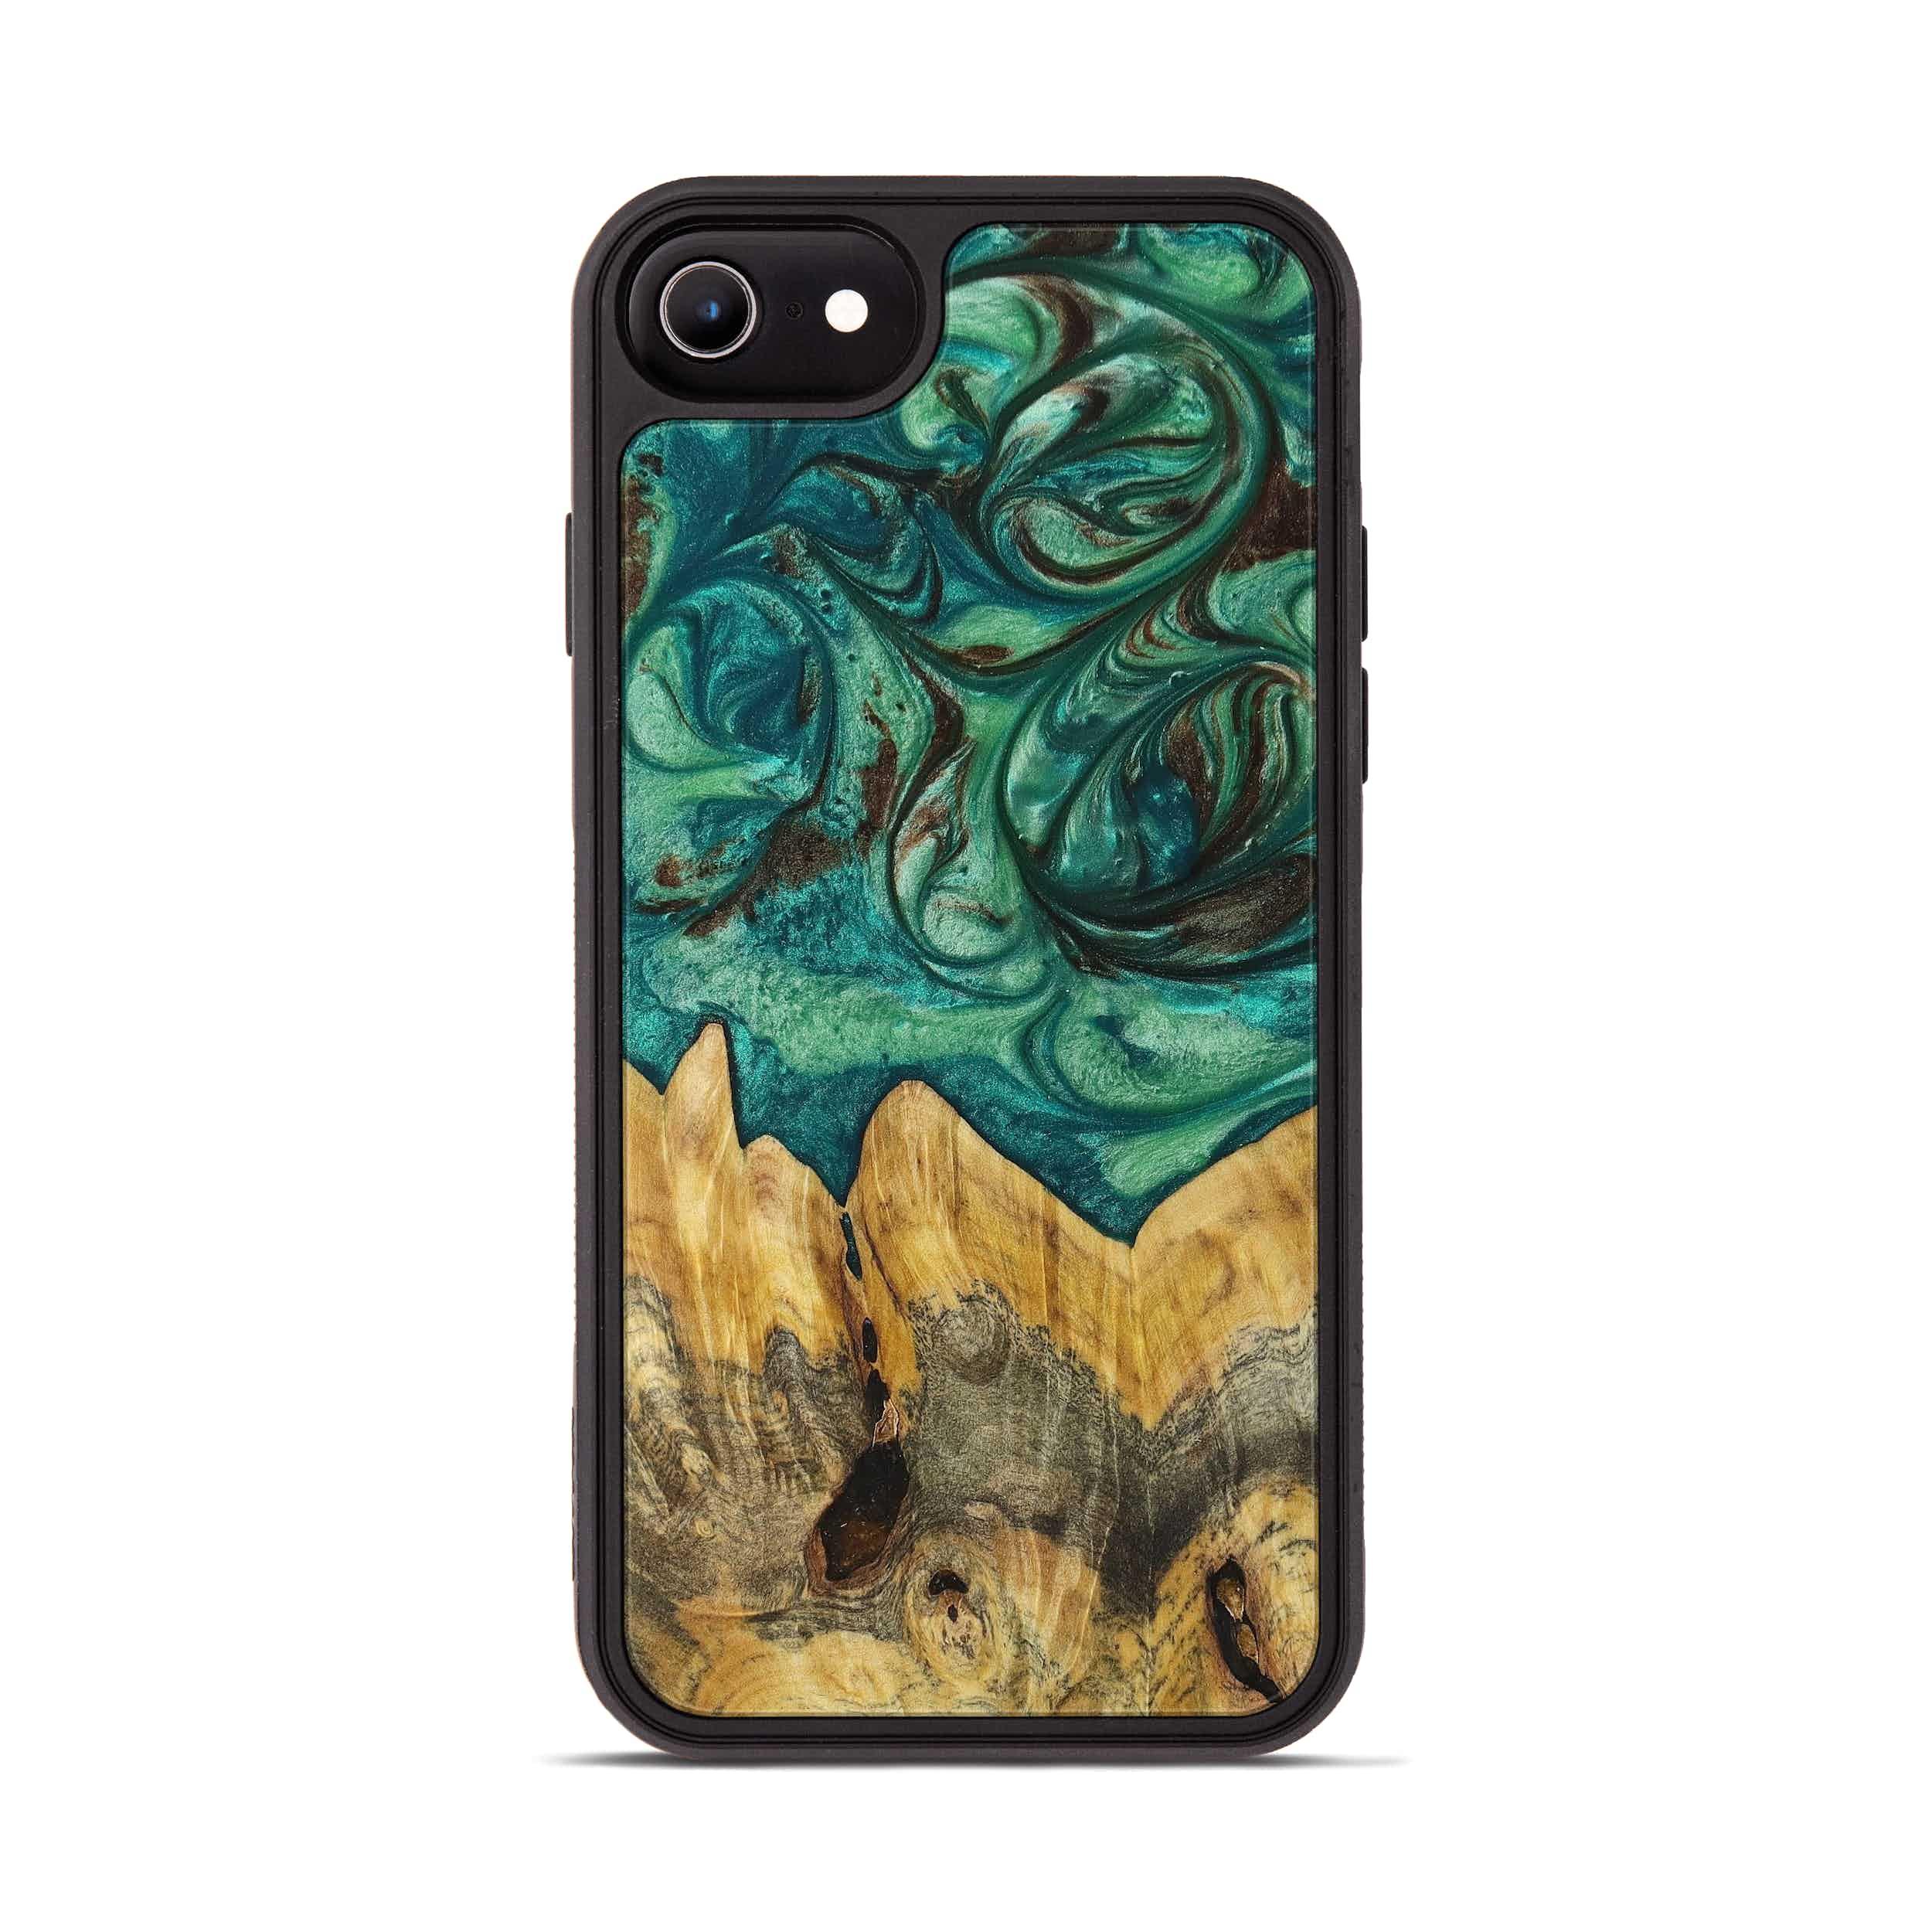 iPhone 6s Wood+Resin Phone Case - Ivory (Dark Green, 397769)